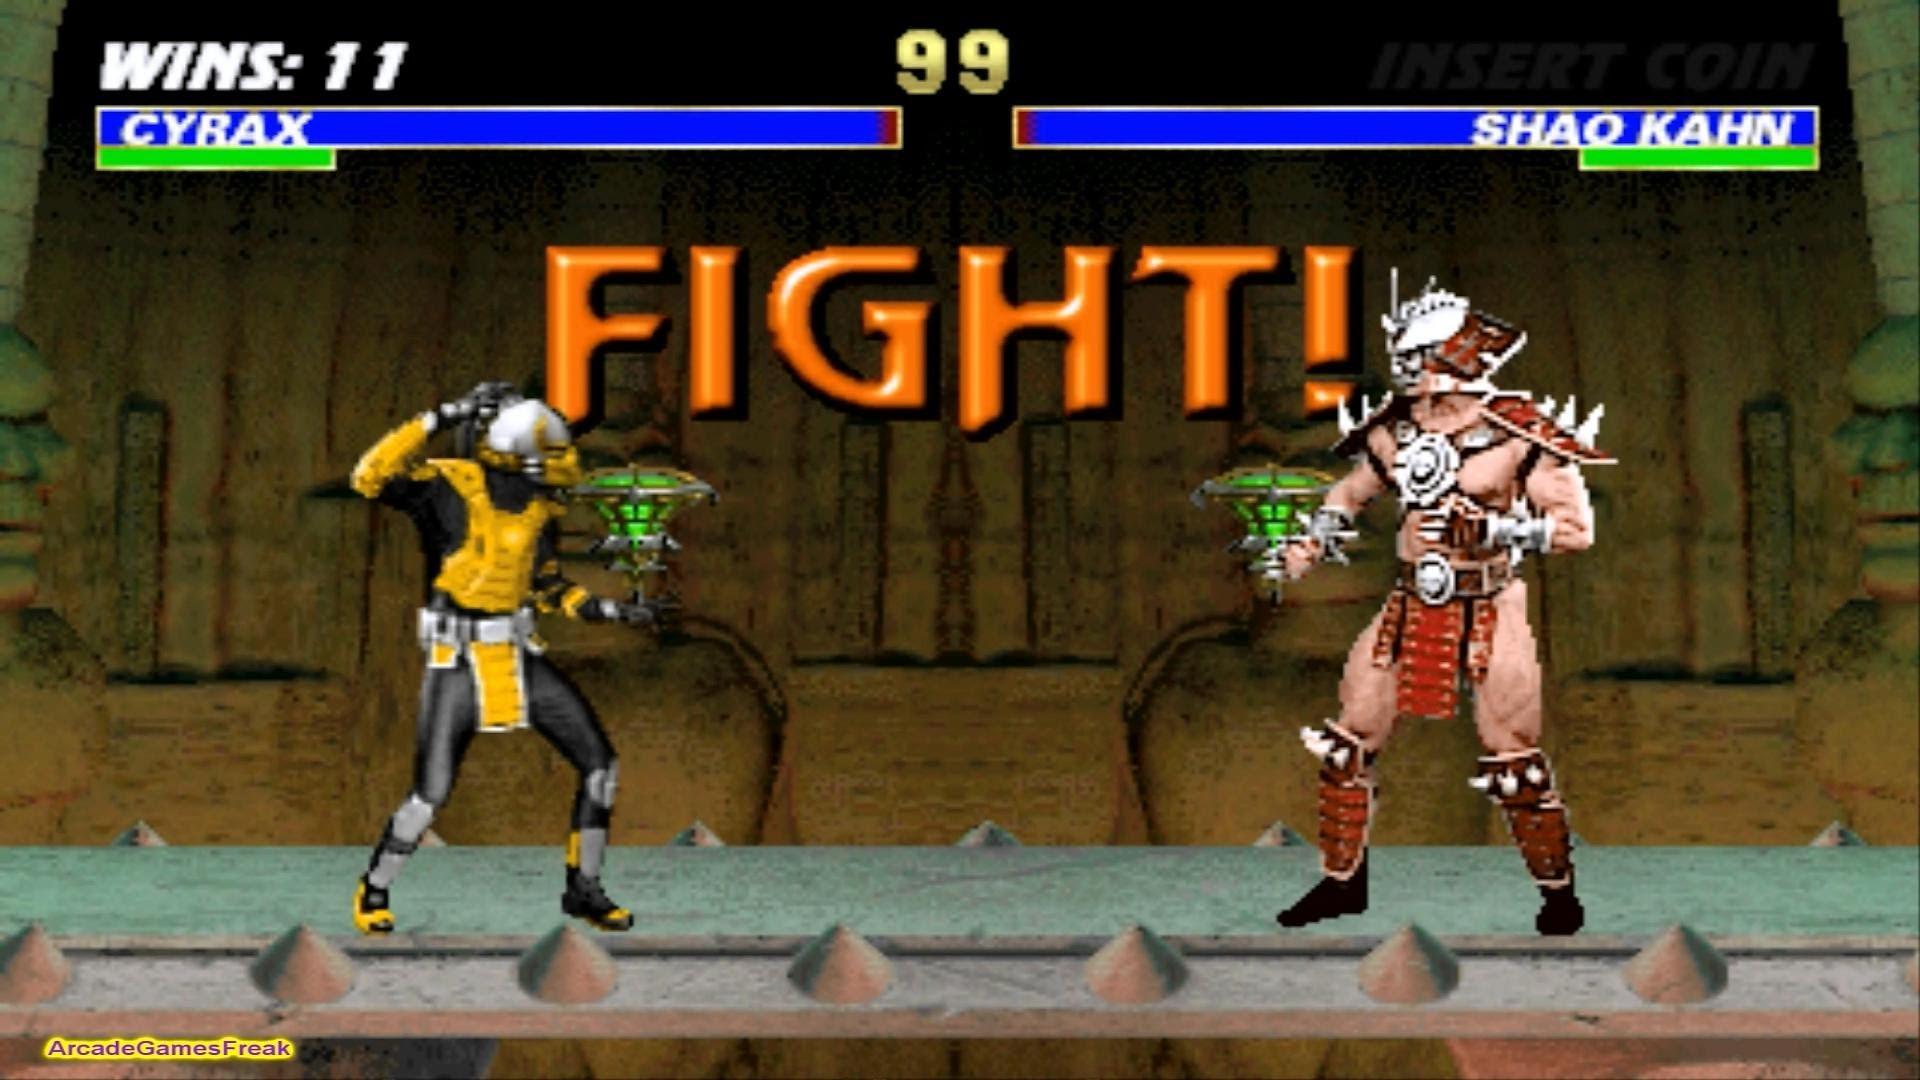 Pizzaria especializada em games terá campeonato de Mortal Kombat